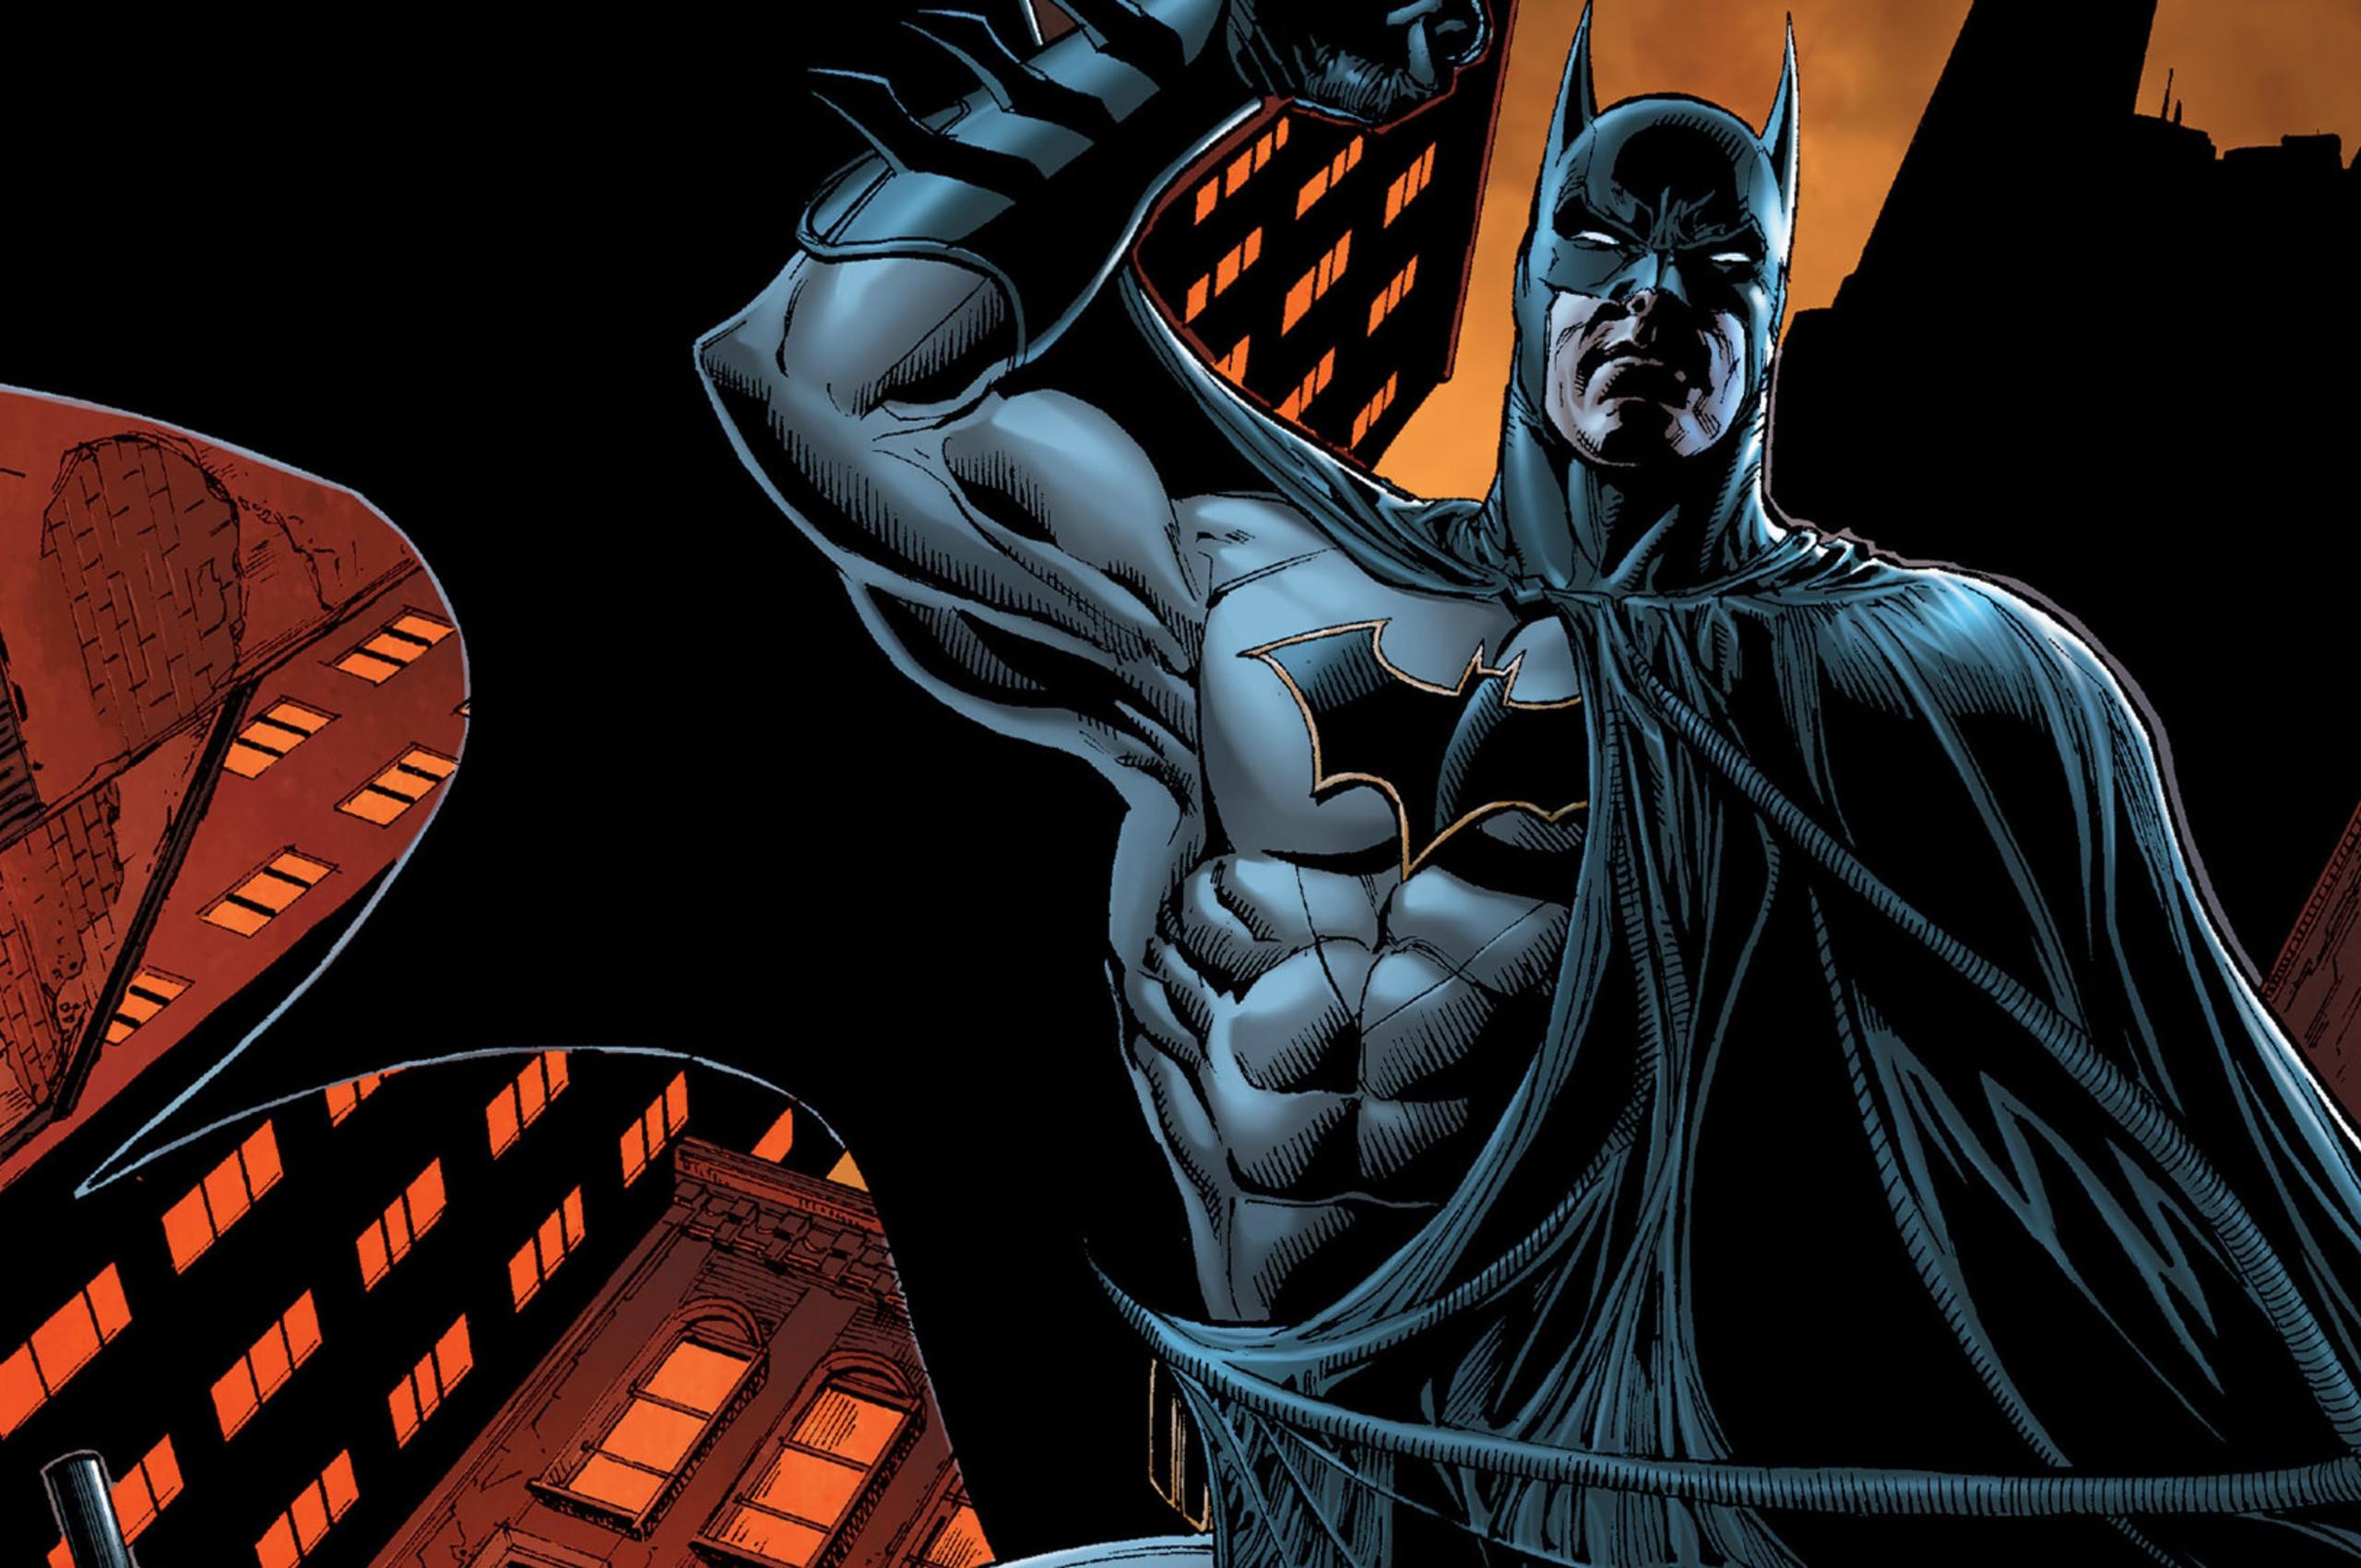 Res: 2560x1700, batman-comic-artwork-si.jpg